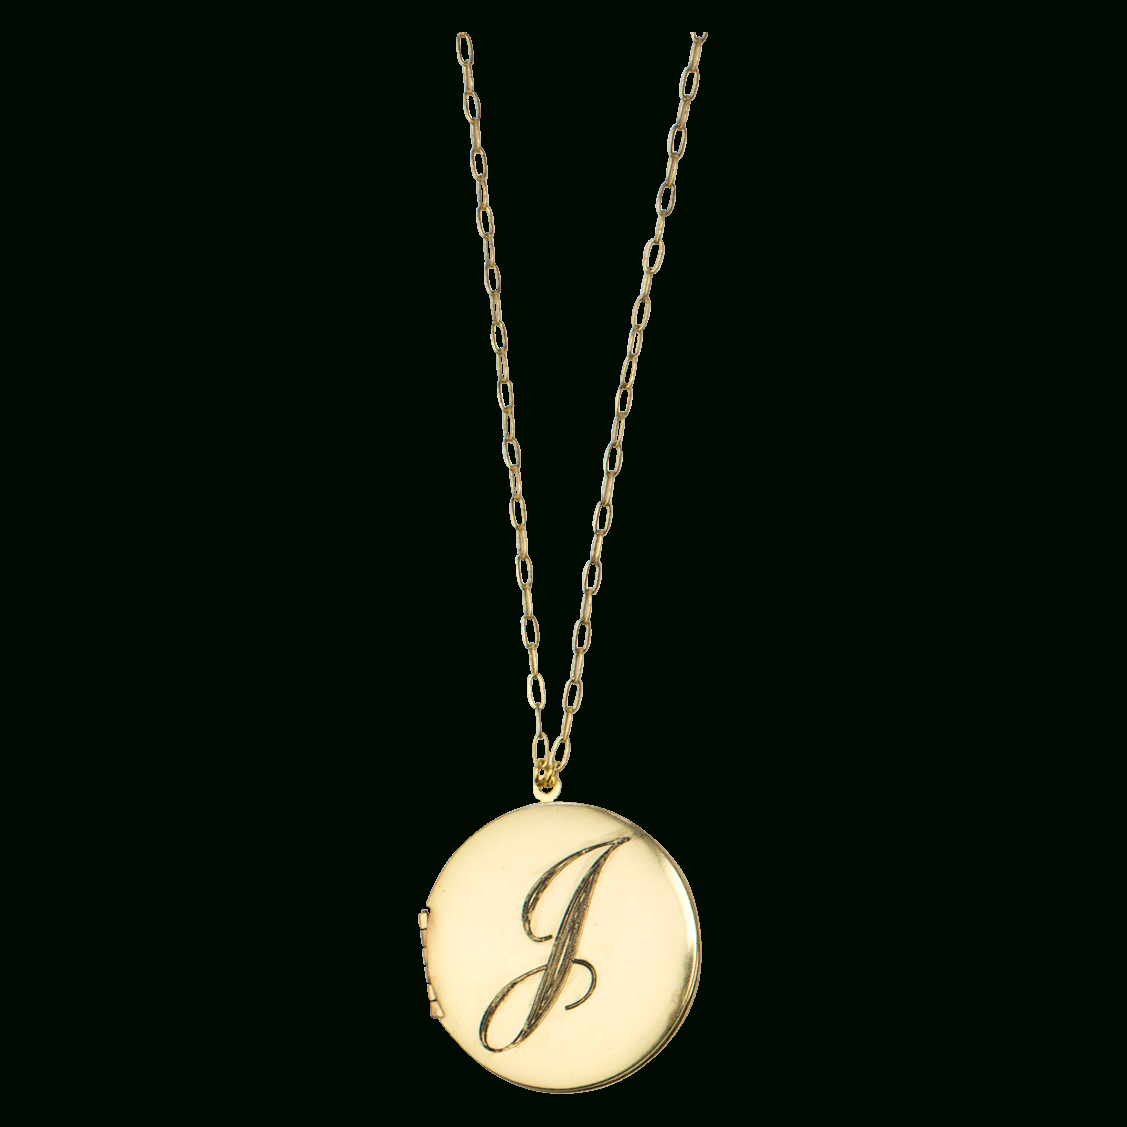 John Wind Monogram Locket Pendant With Regard To Latest Sparkling Daisy Flower Locket Element Necklaces (Gallery 25 of 25)